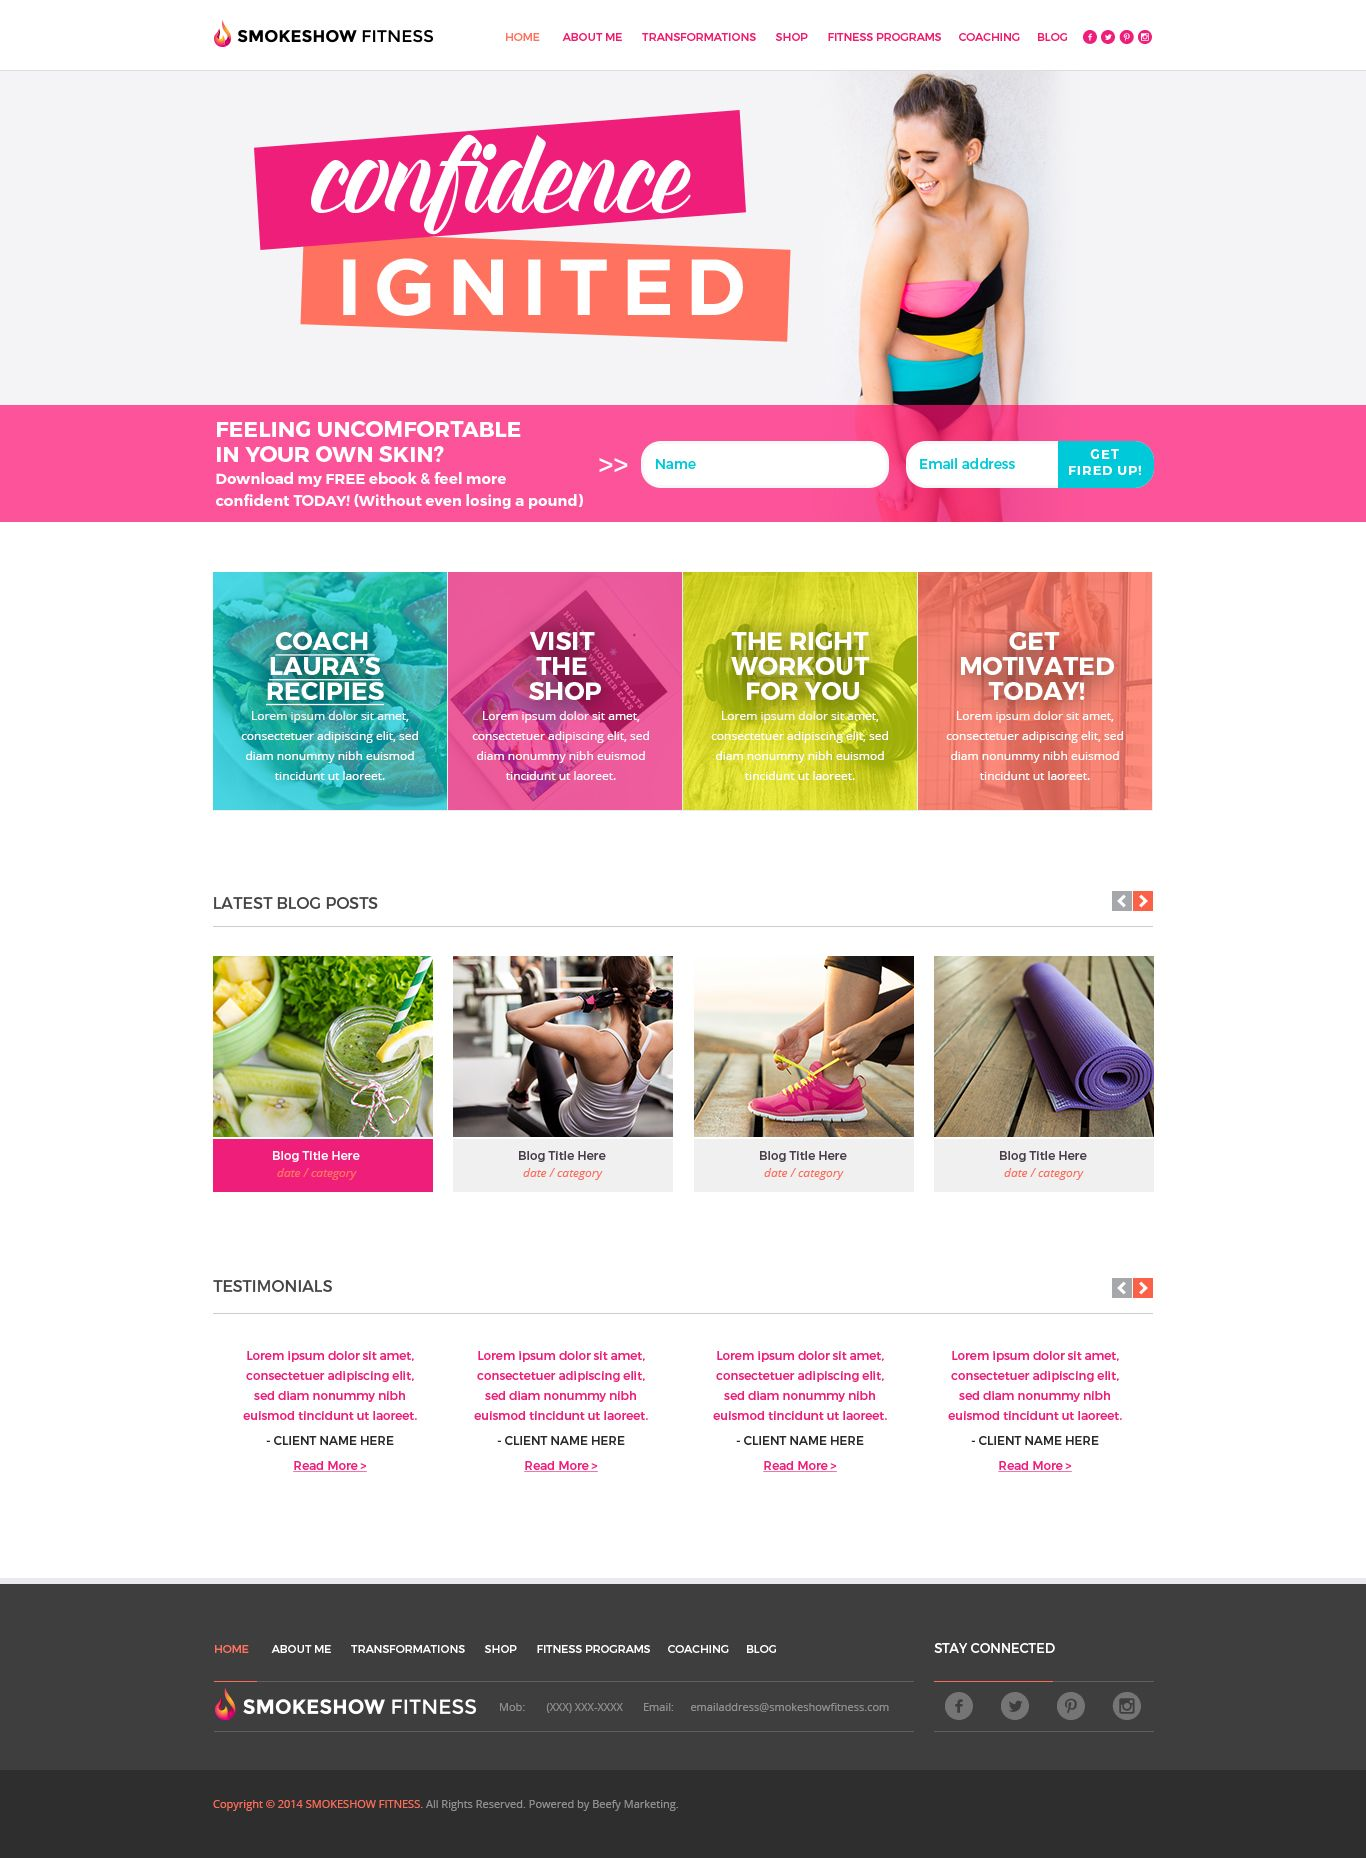 Smokeshow Fitness Blog Website Design Webdesign Inspiratie Webdesign